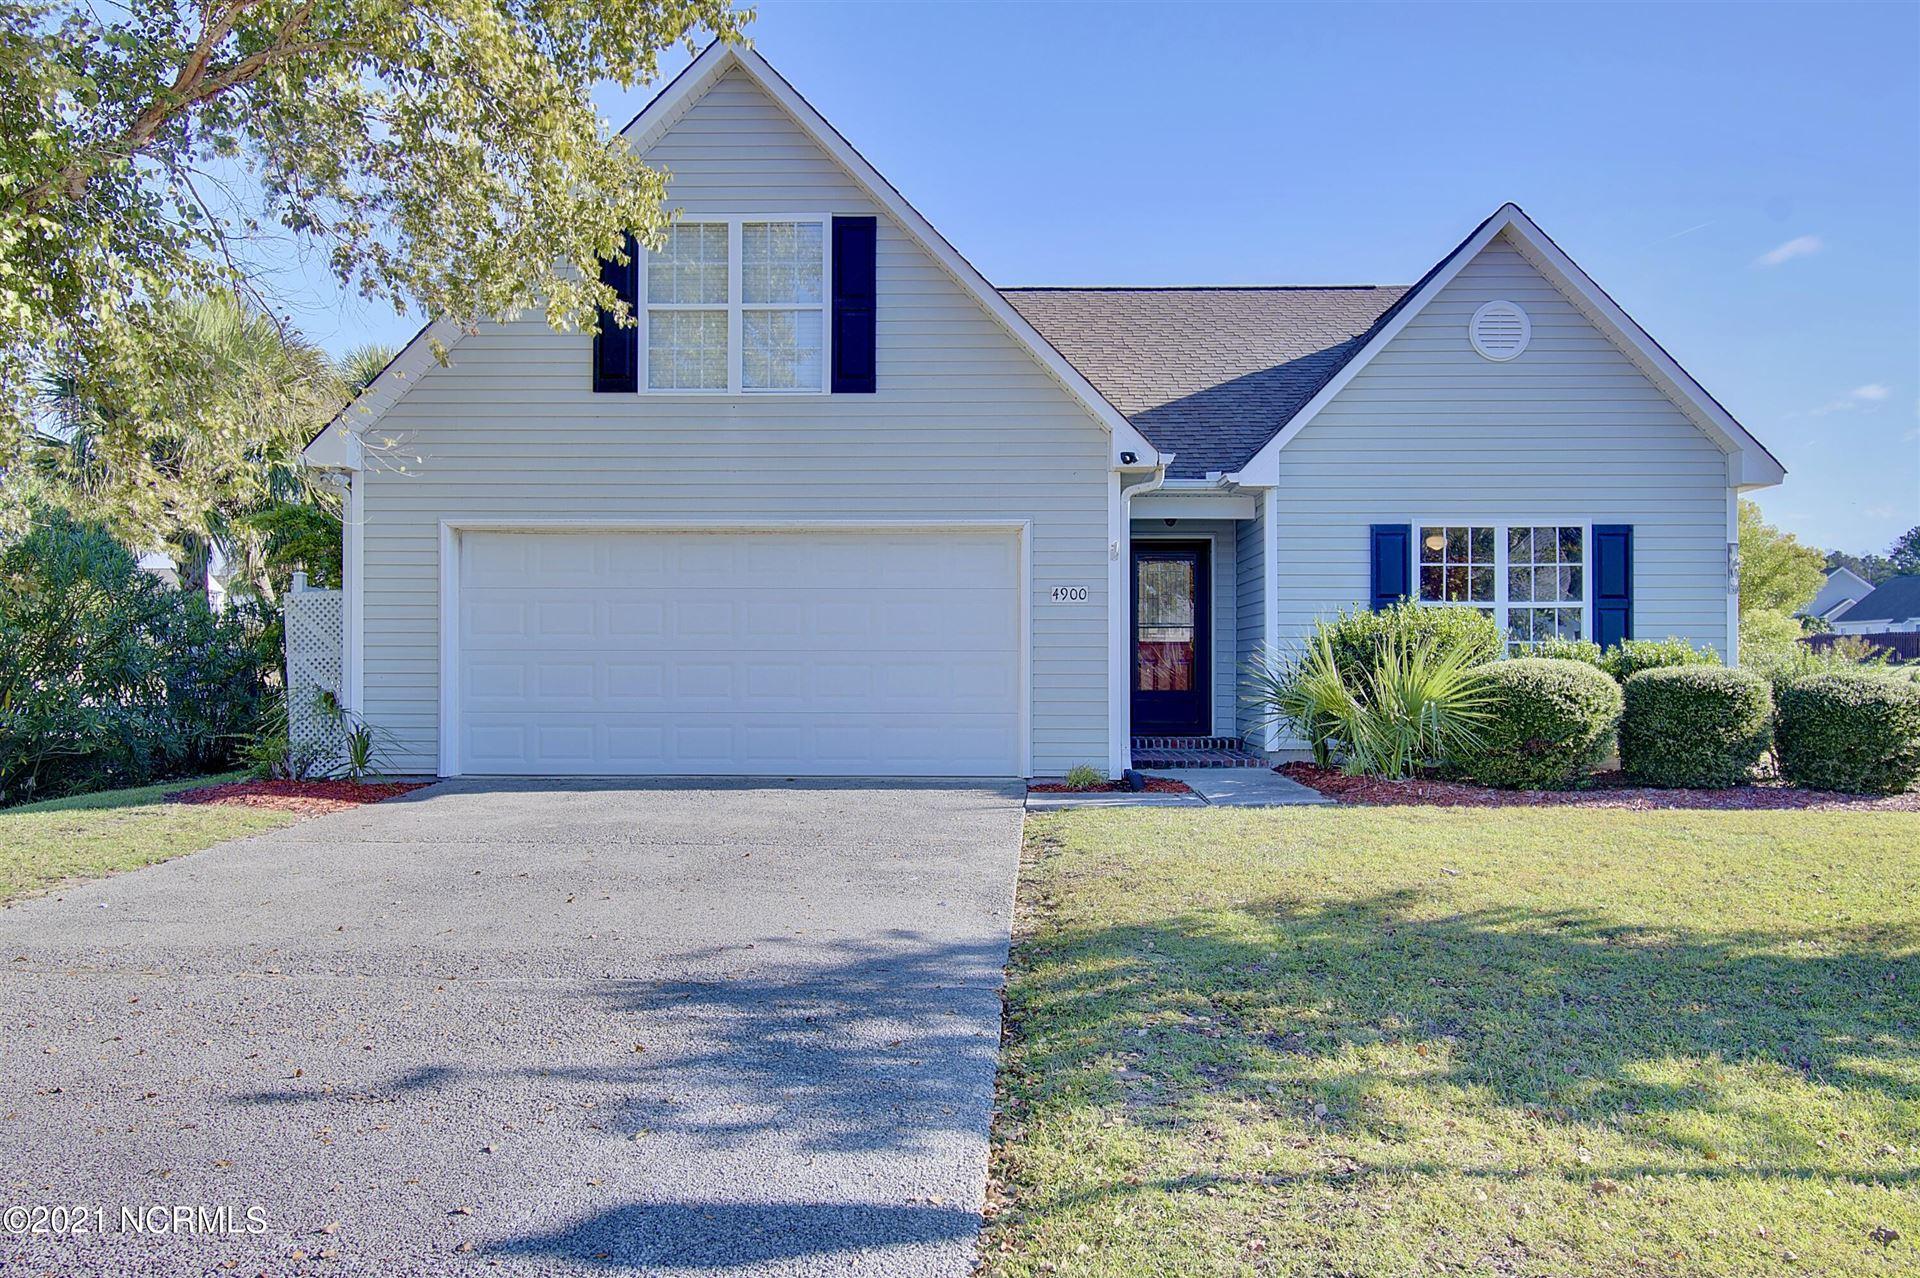 Photo of 4900 N Hampton Drive SE, Southport, NC 28461 (MLS # 100293410)